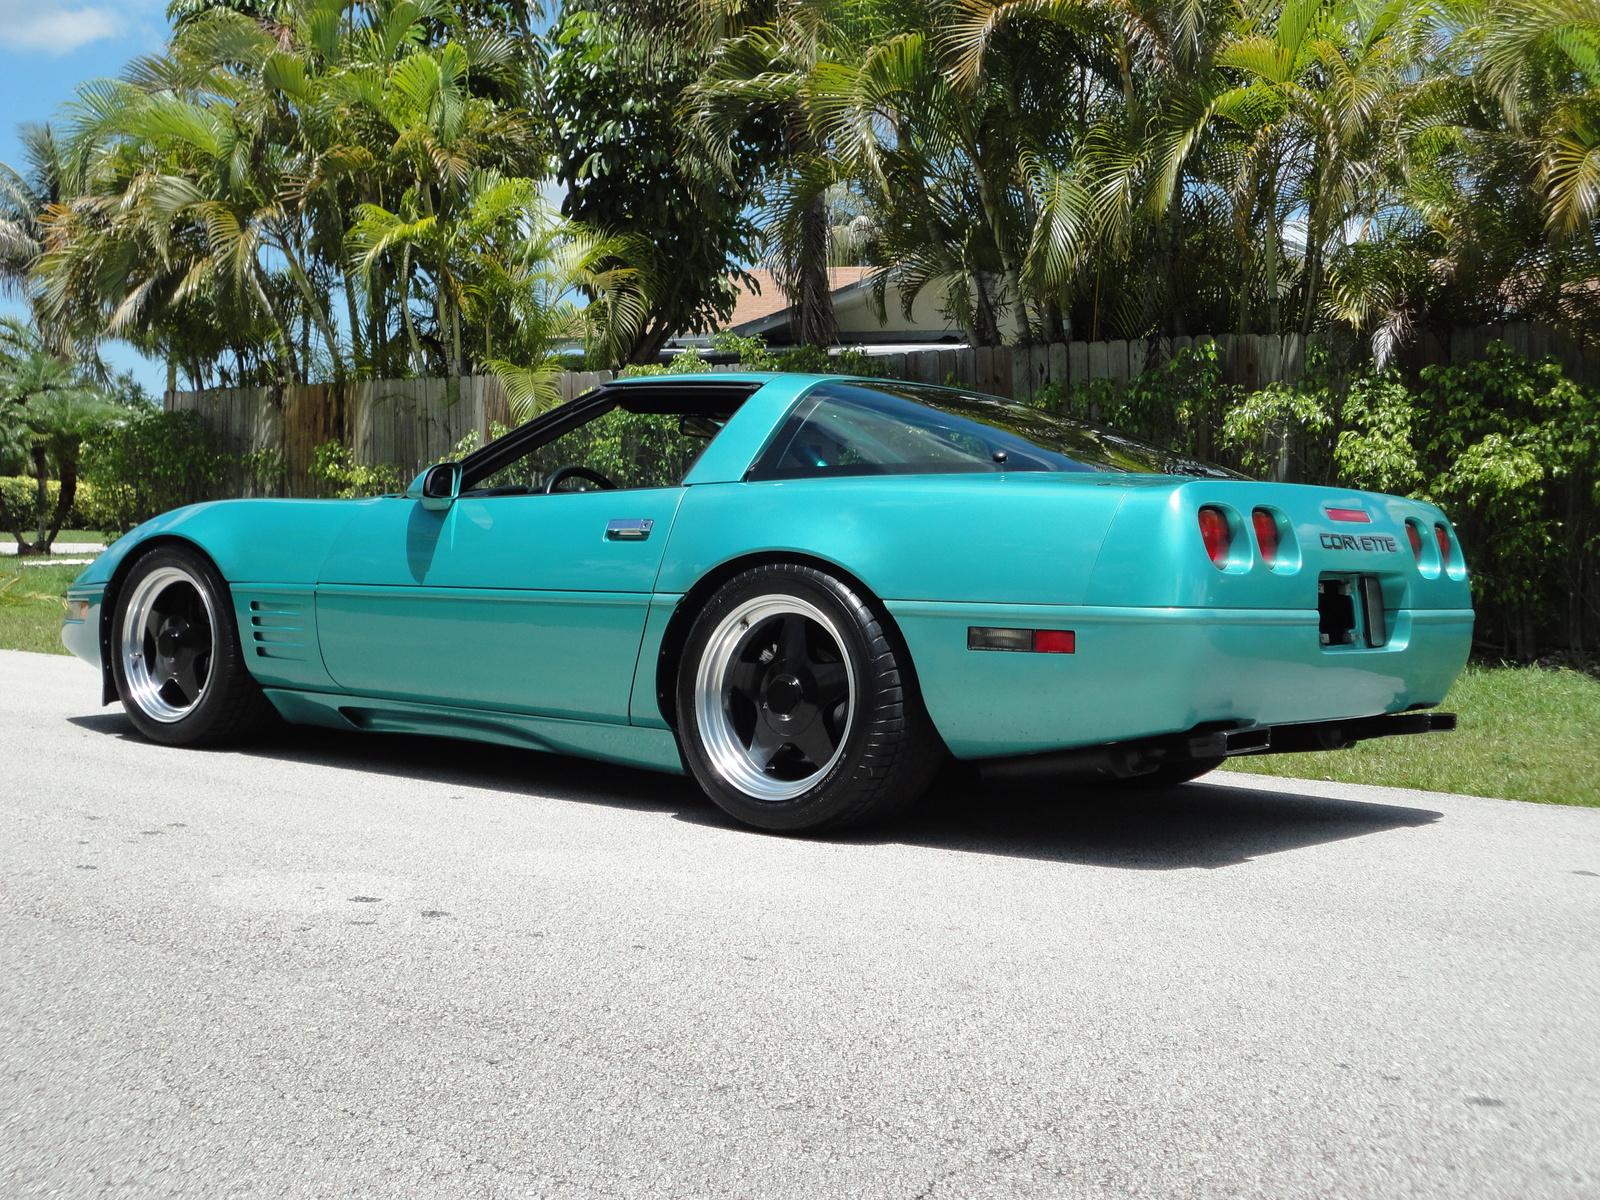 1990 C4 Corvette furthermore 12 further 7178267261 moreover 1985 Chevrolet Corvette Pictures C421 pi15660703 as well Exterior 51912650. on 2006 corvette zr1 specs